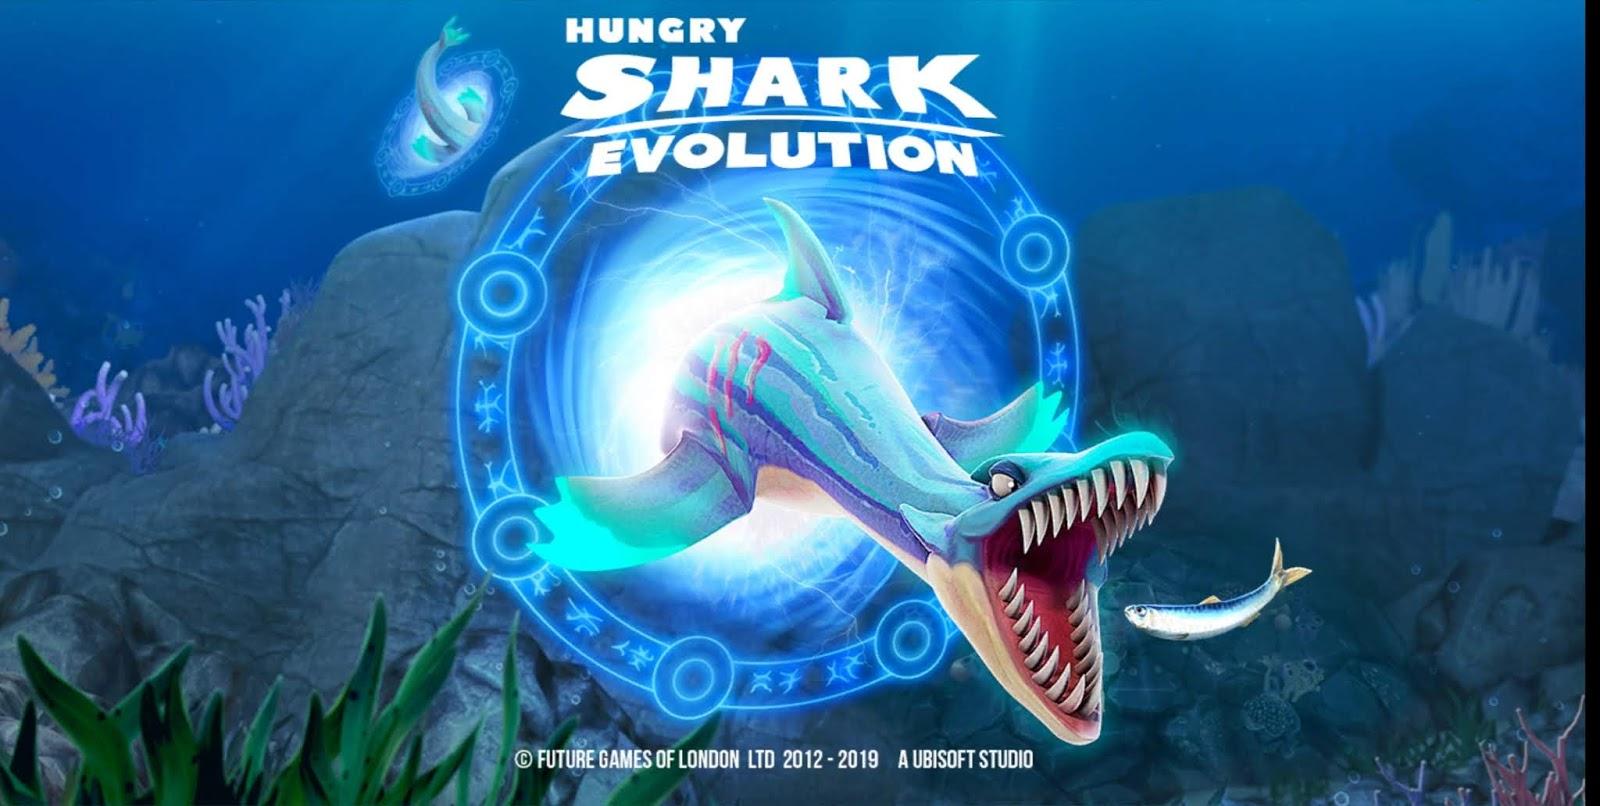 Hungry Shark Evolution Mod Apk Version 6 6 2 Unlimited Money